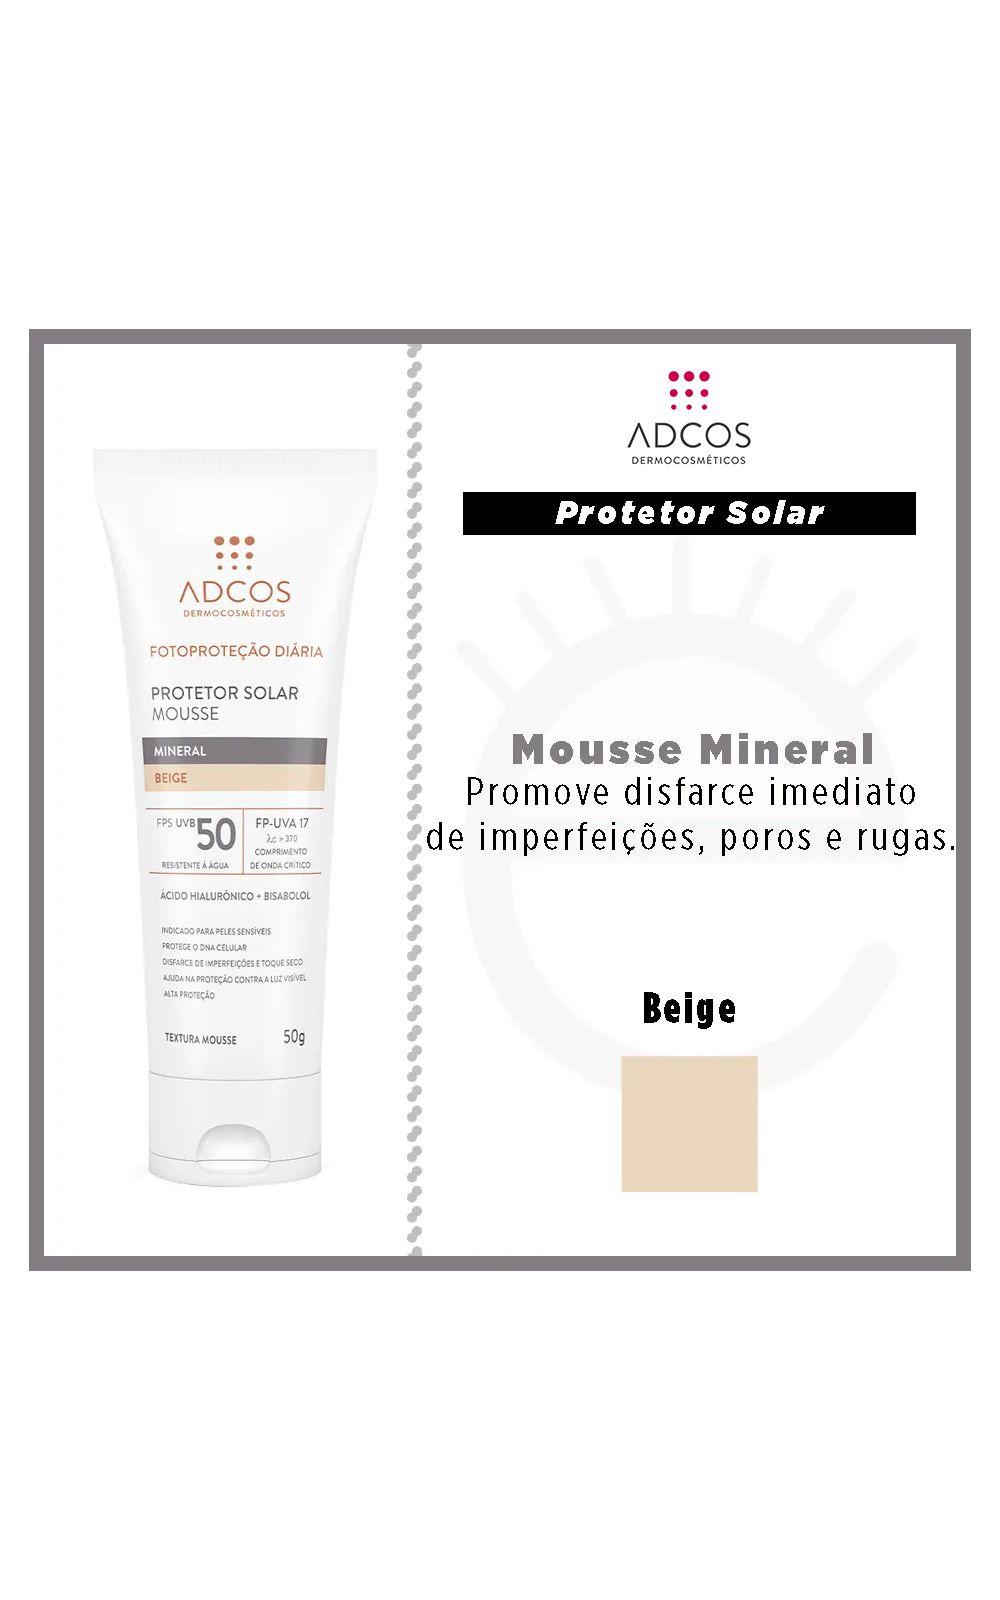 Foto 4 - Protetor Solar ADCOS - Fotoproteção Mousse Mineral Beige - Beige